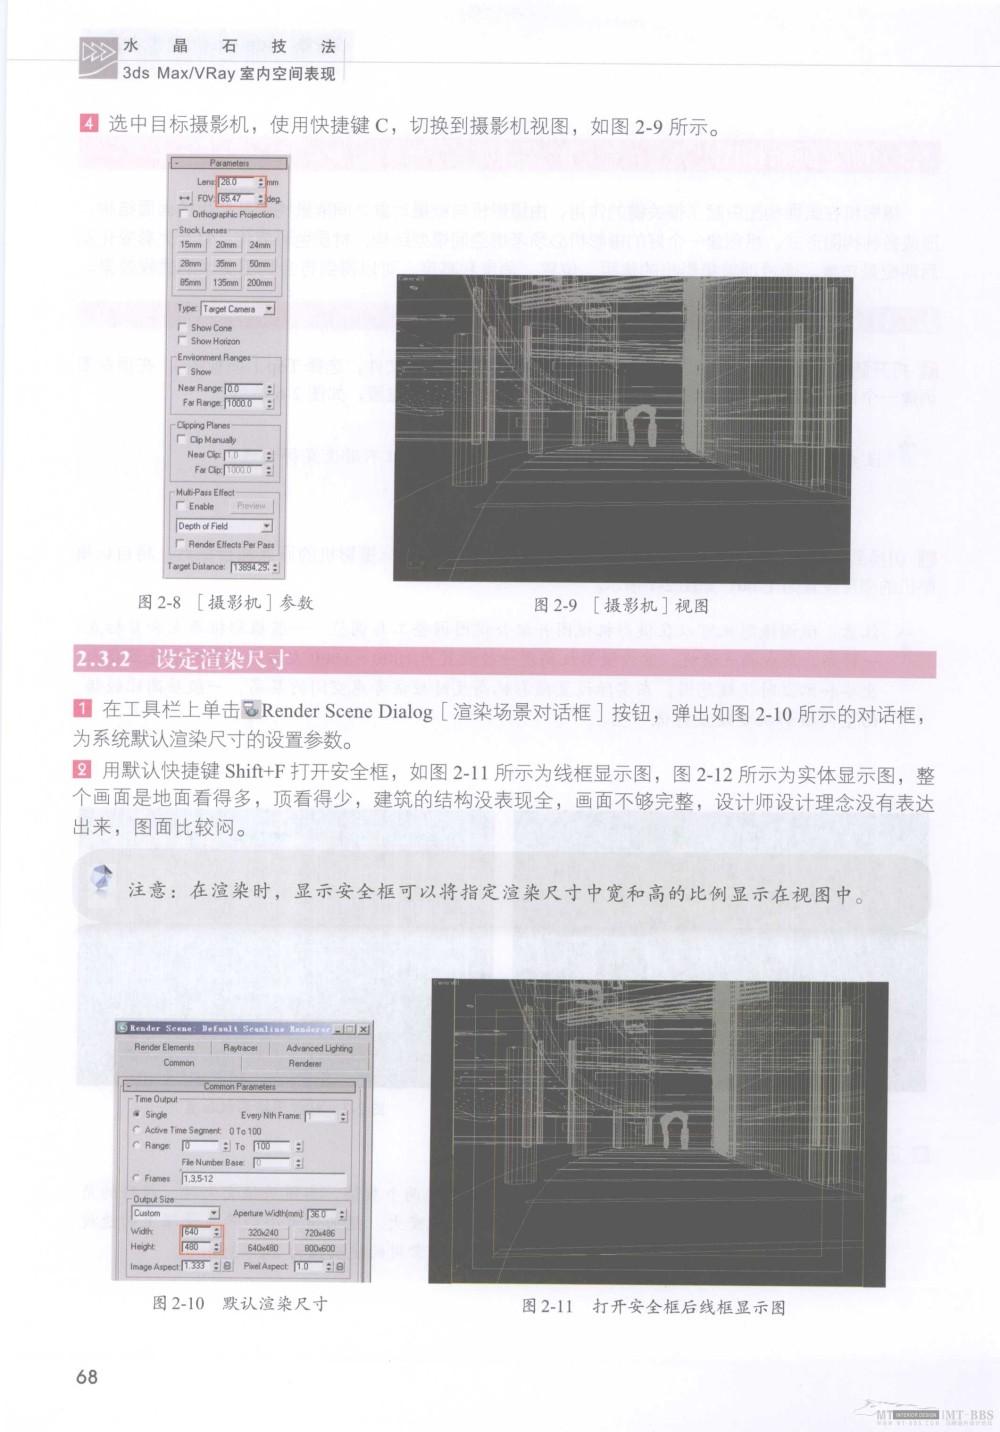 水晶石技法-3ds_Max&VRay室内空间表现_水晶石技法-3ds_Max&VRay室内空间表现_页面_074.jpg